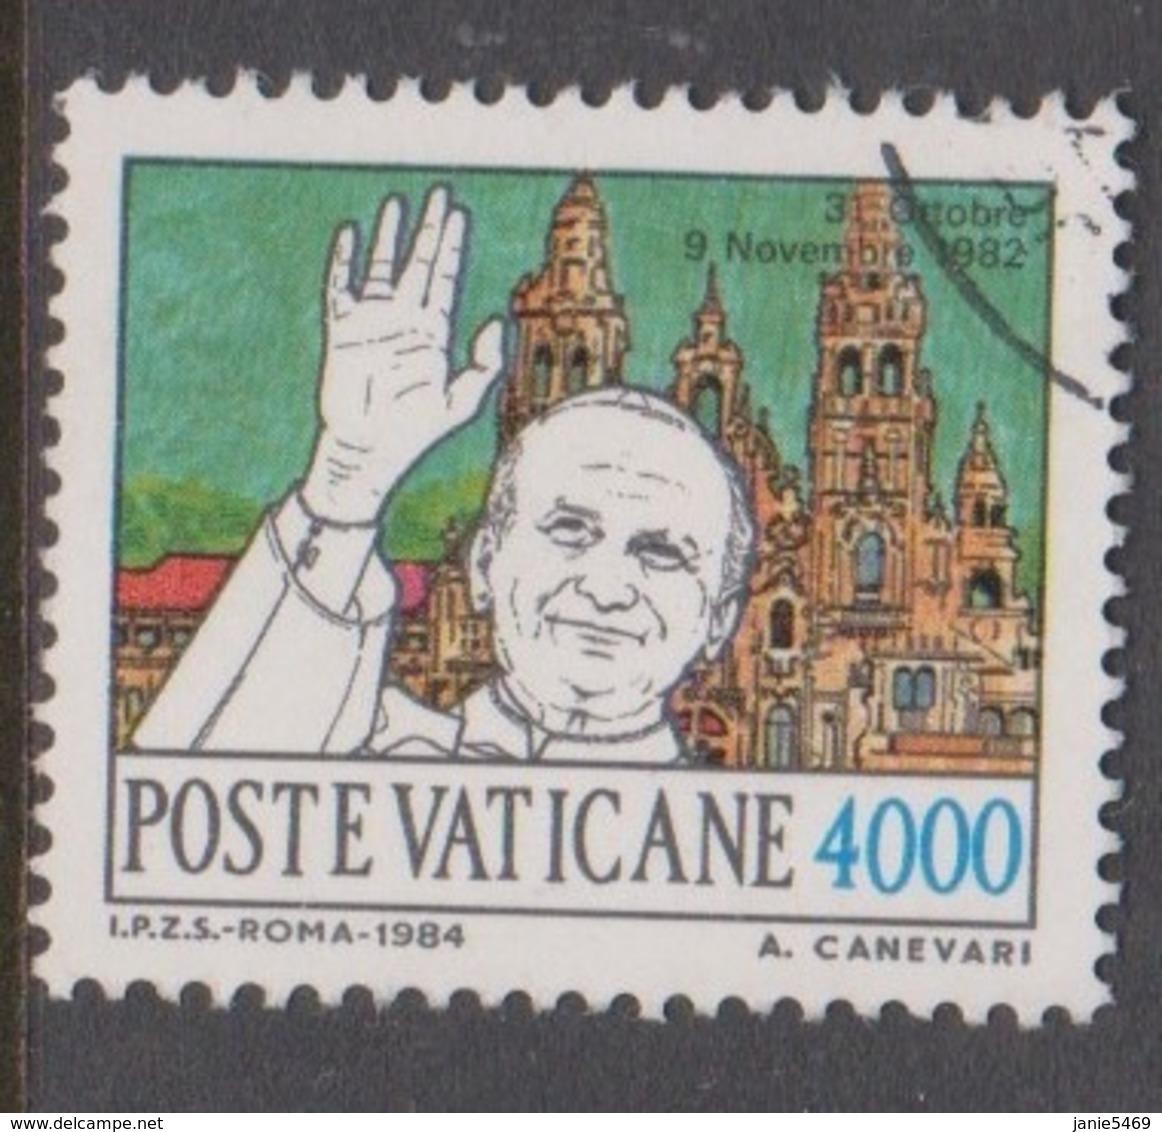 Vatican City S 779 1984 Journeys Of Pope John Paul II ,4000 Lire Used - Vaticano (Ciudad Del)